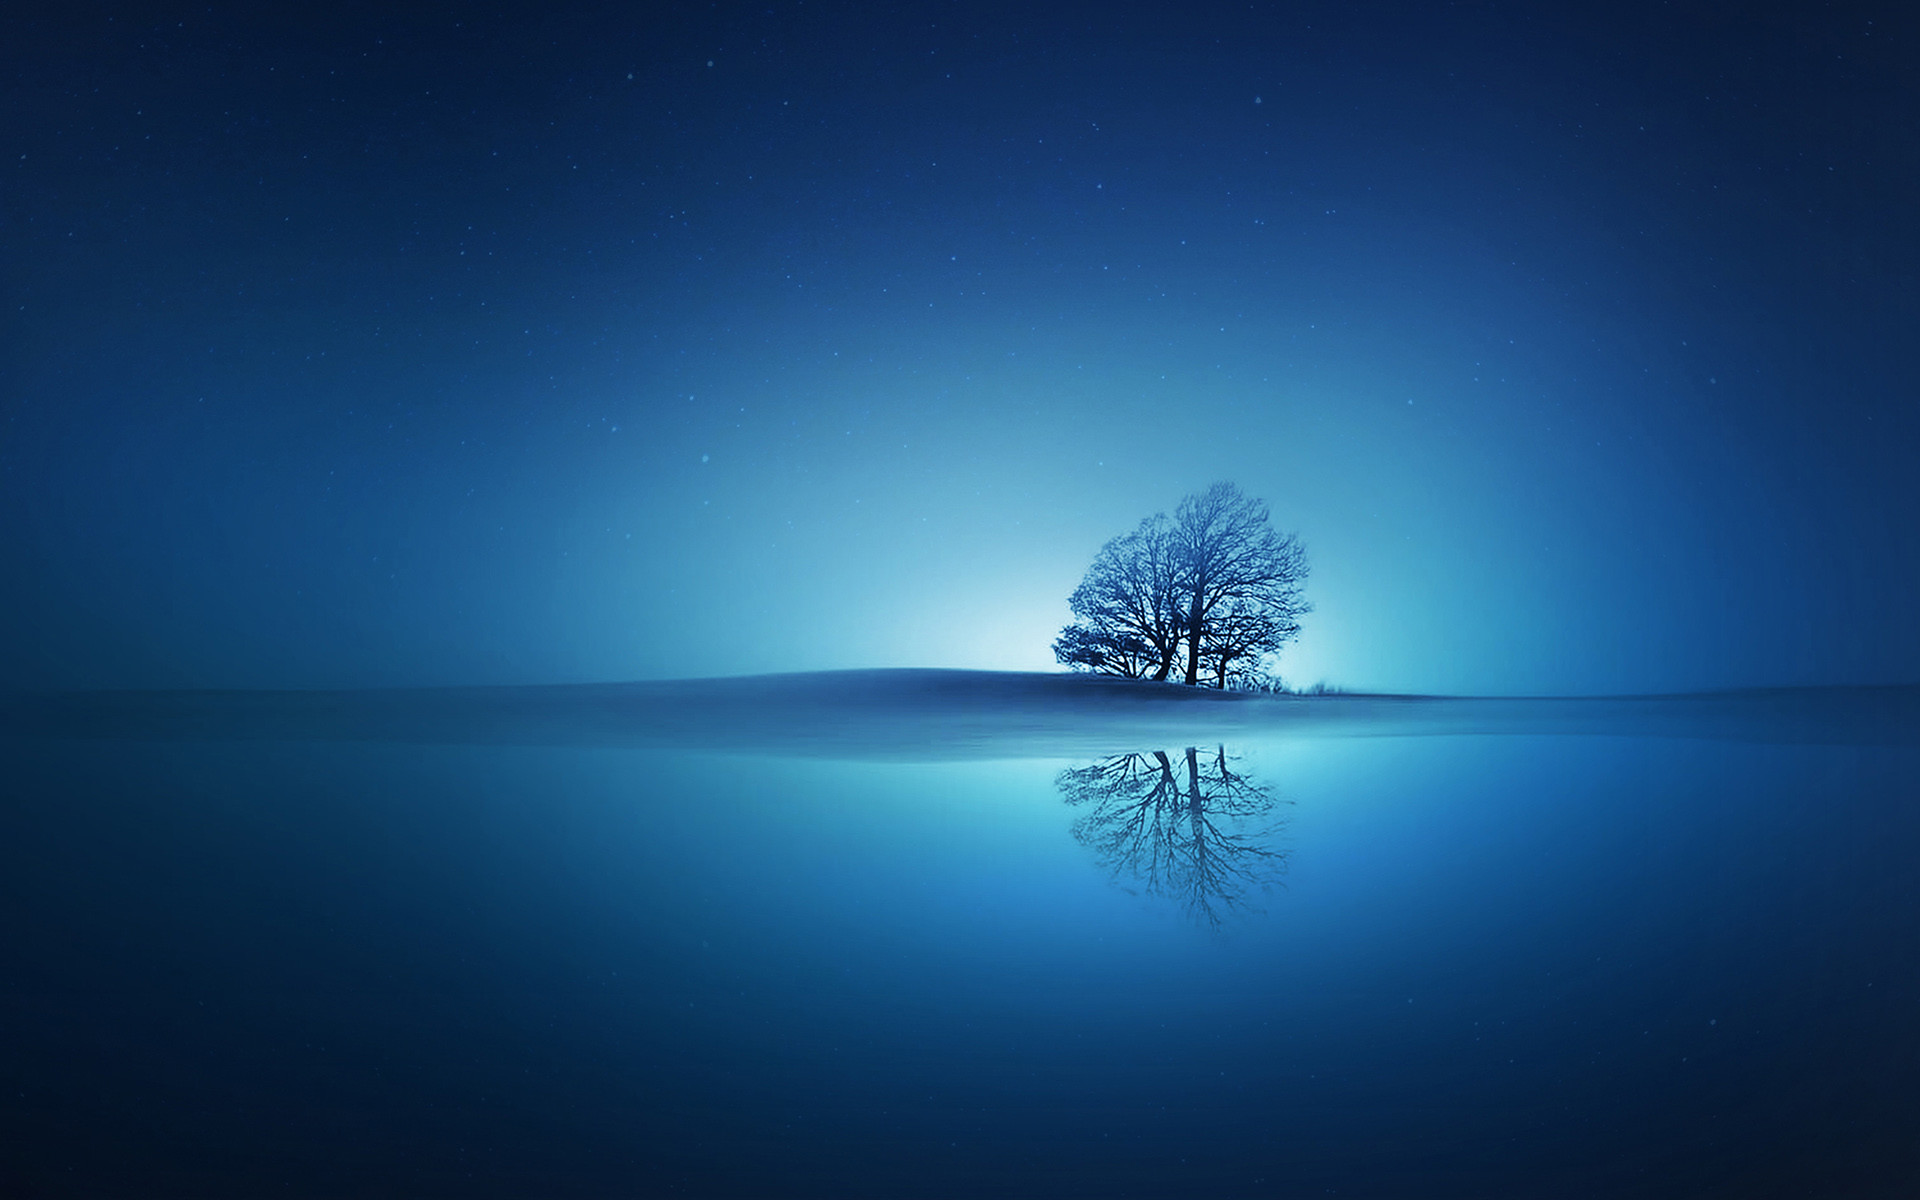 Blue Background Wallpaper Laptop | HD Wallpapers | Pinterest | Blue  backgrounds, Desktop backgrounds and Wallpaper